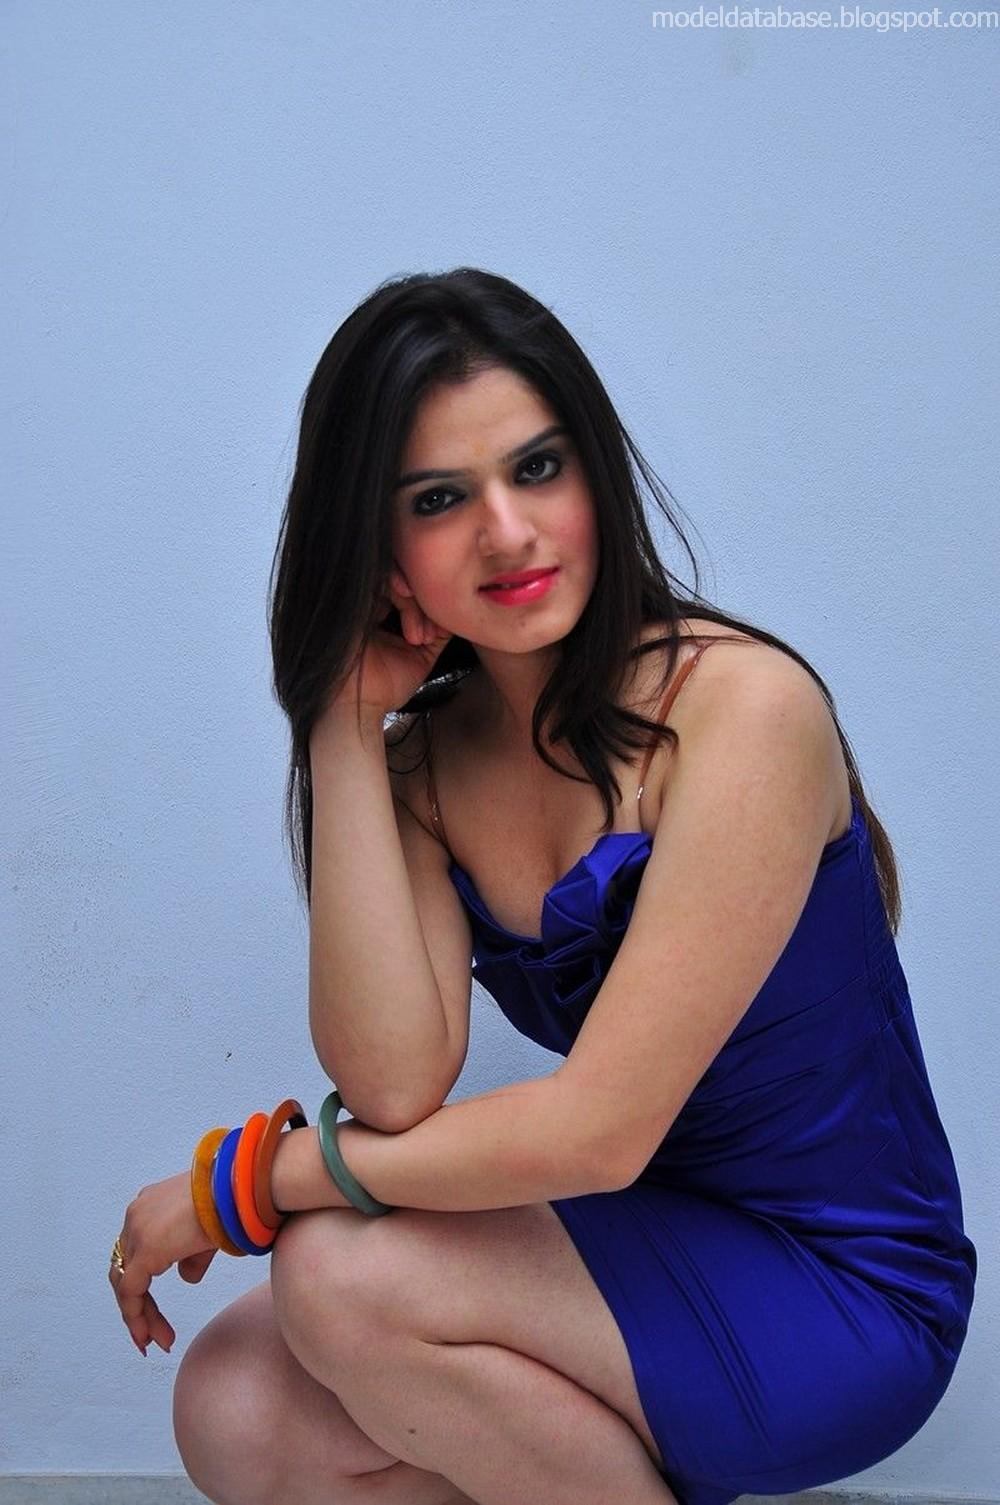 Shefali Sharma stunningly hot thigh show in a very tight blue dress HQ ...